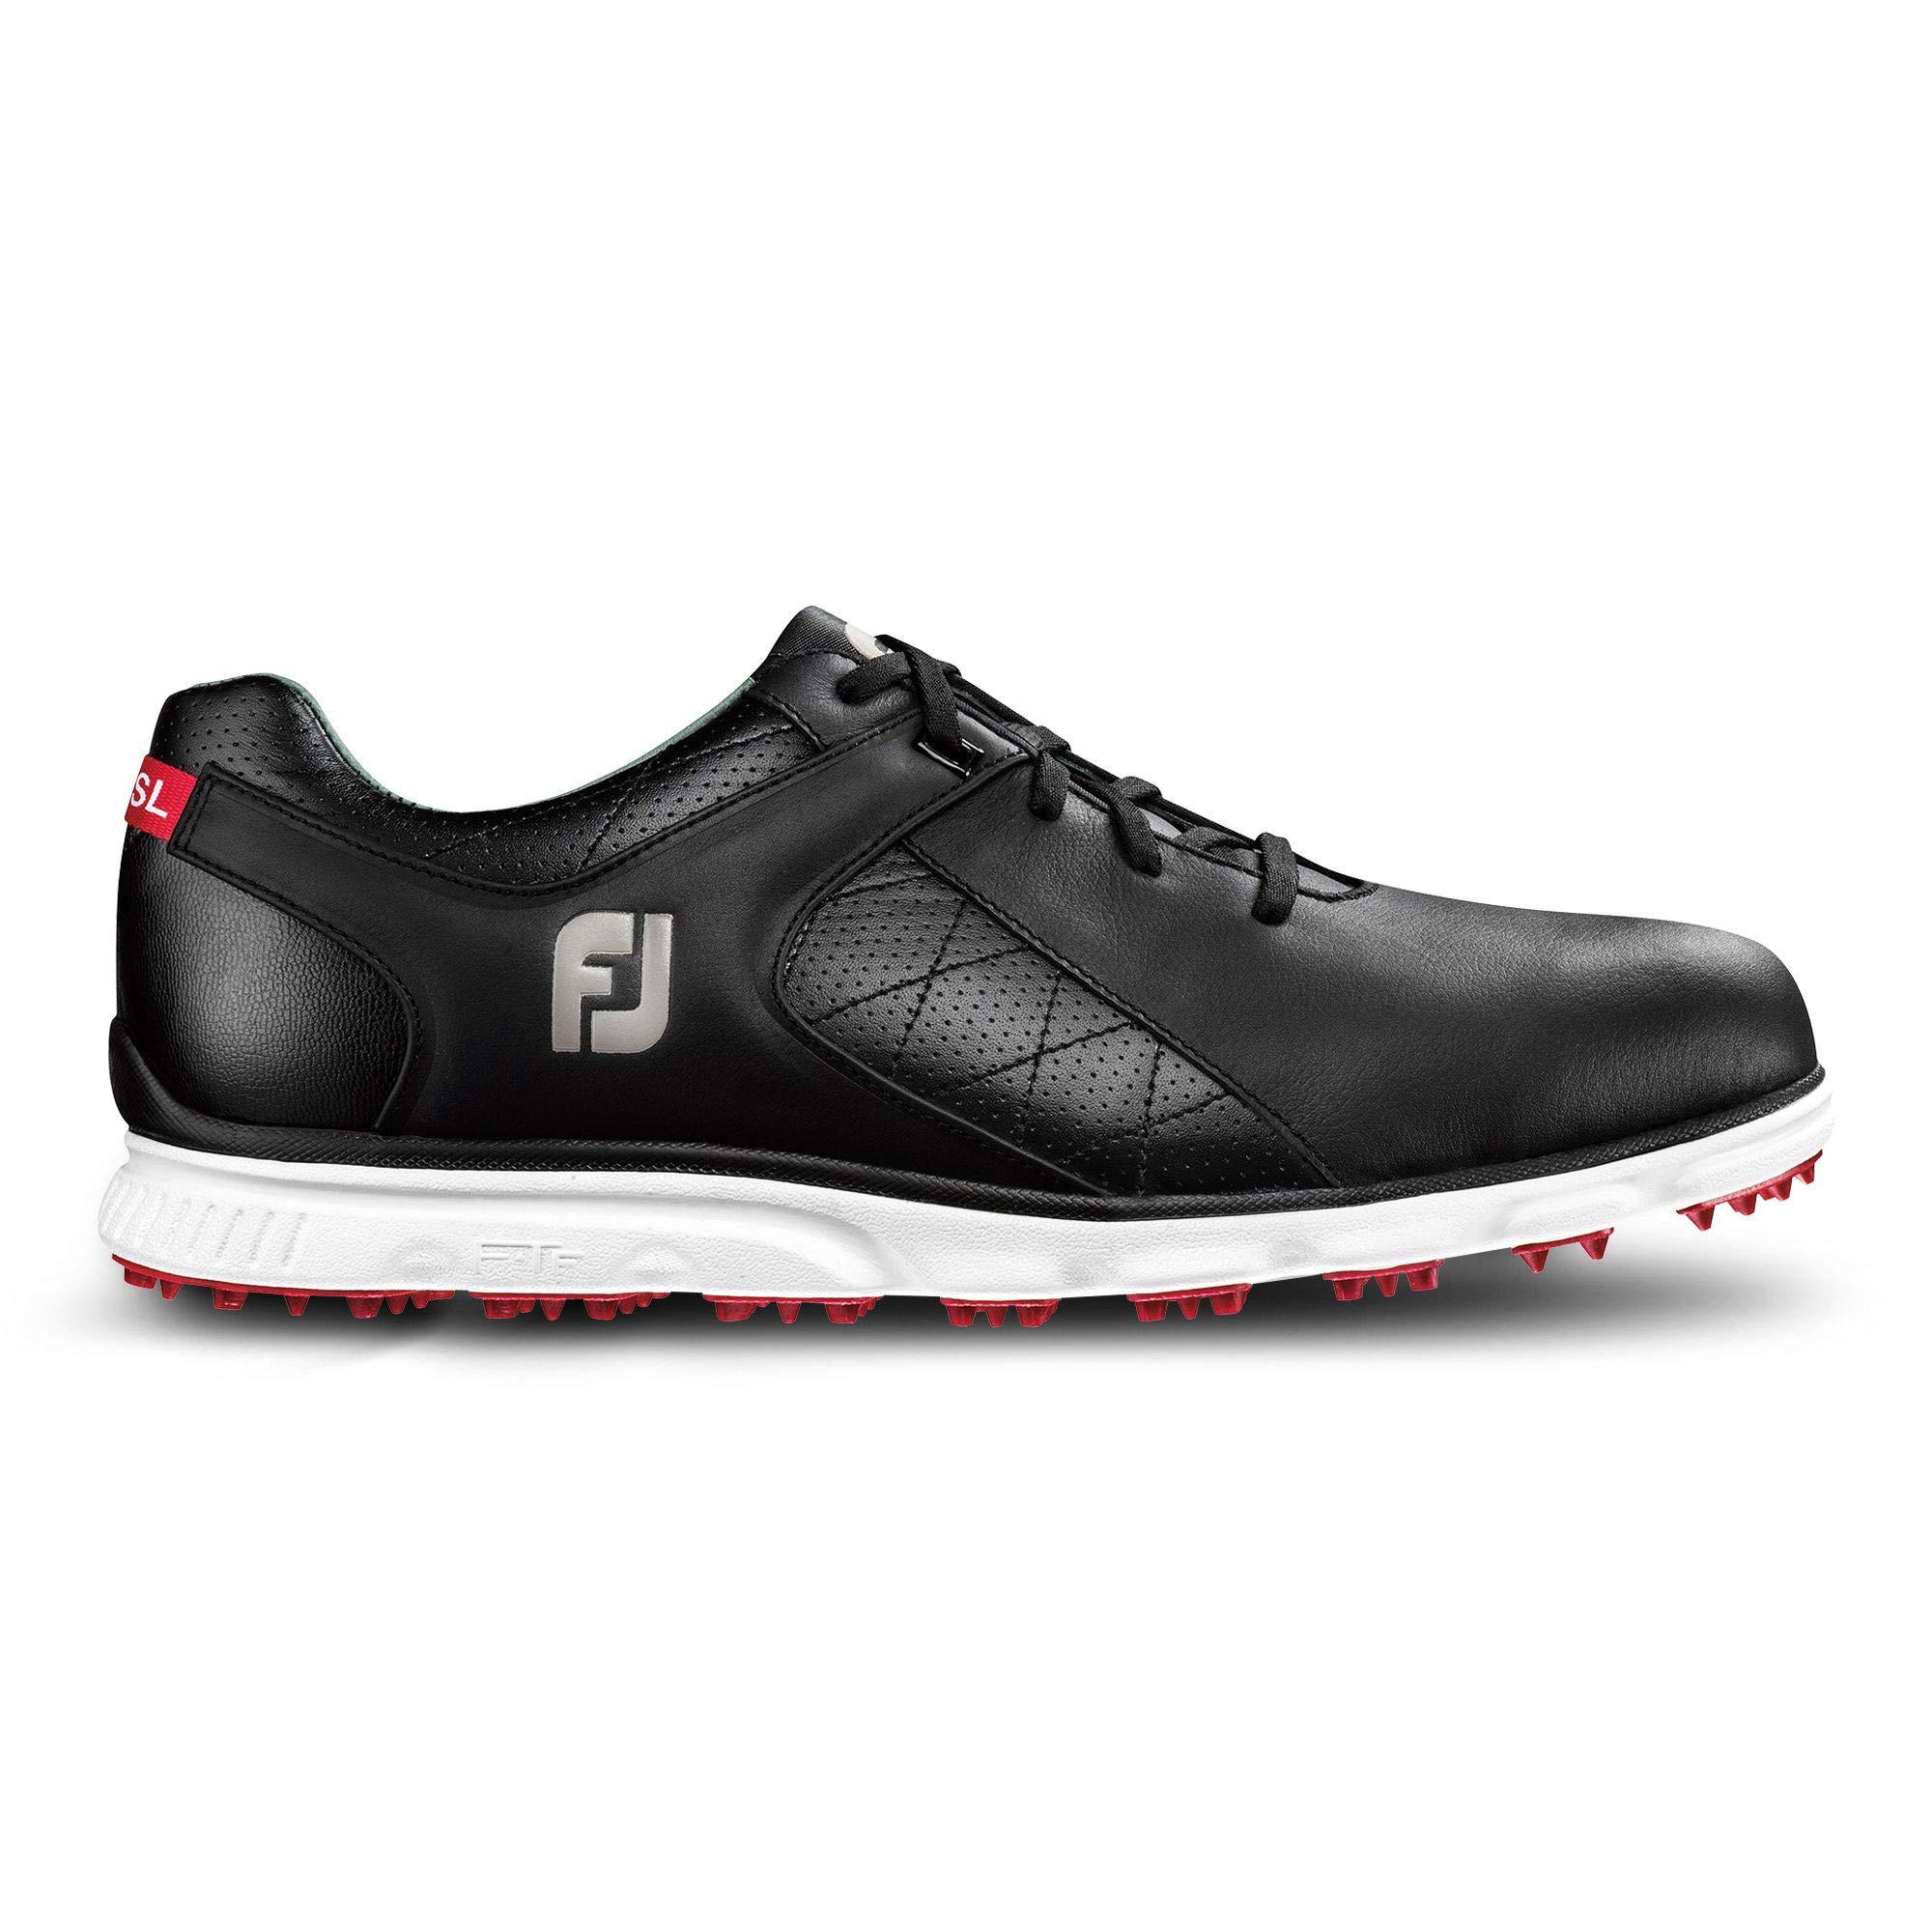 FootJoy Men's Pro/SL-Previous Season Style Golf Shoes Black 8 M US